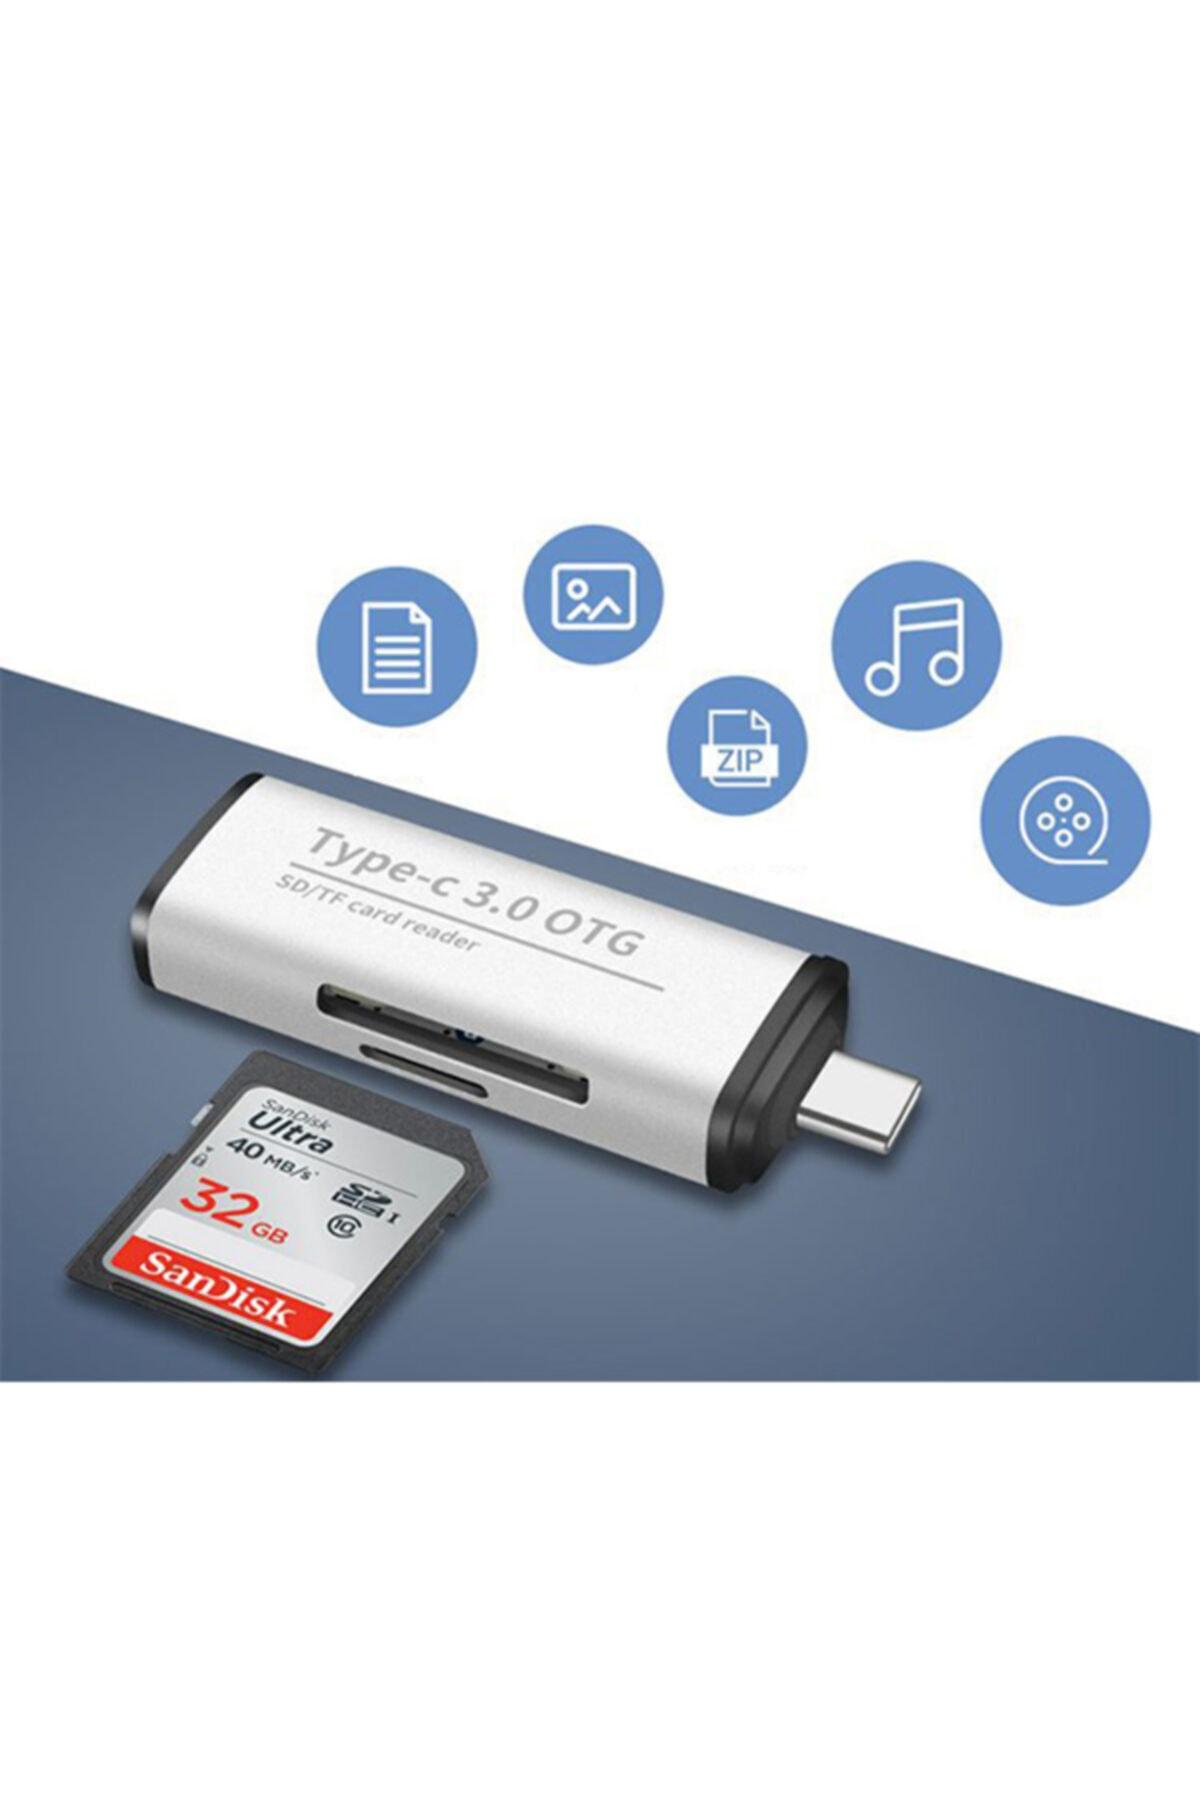 Ally Mobile Ads-103 Usb Type C 3.0 Hızlı Card Reader Sd-tf Hafıza Kart Okuyucu 1